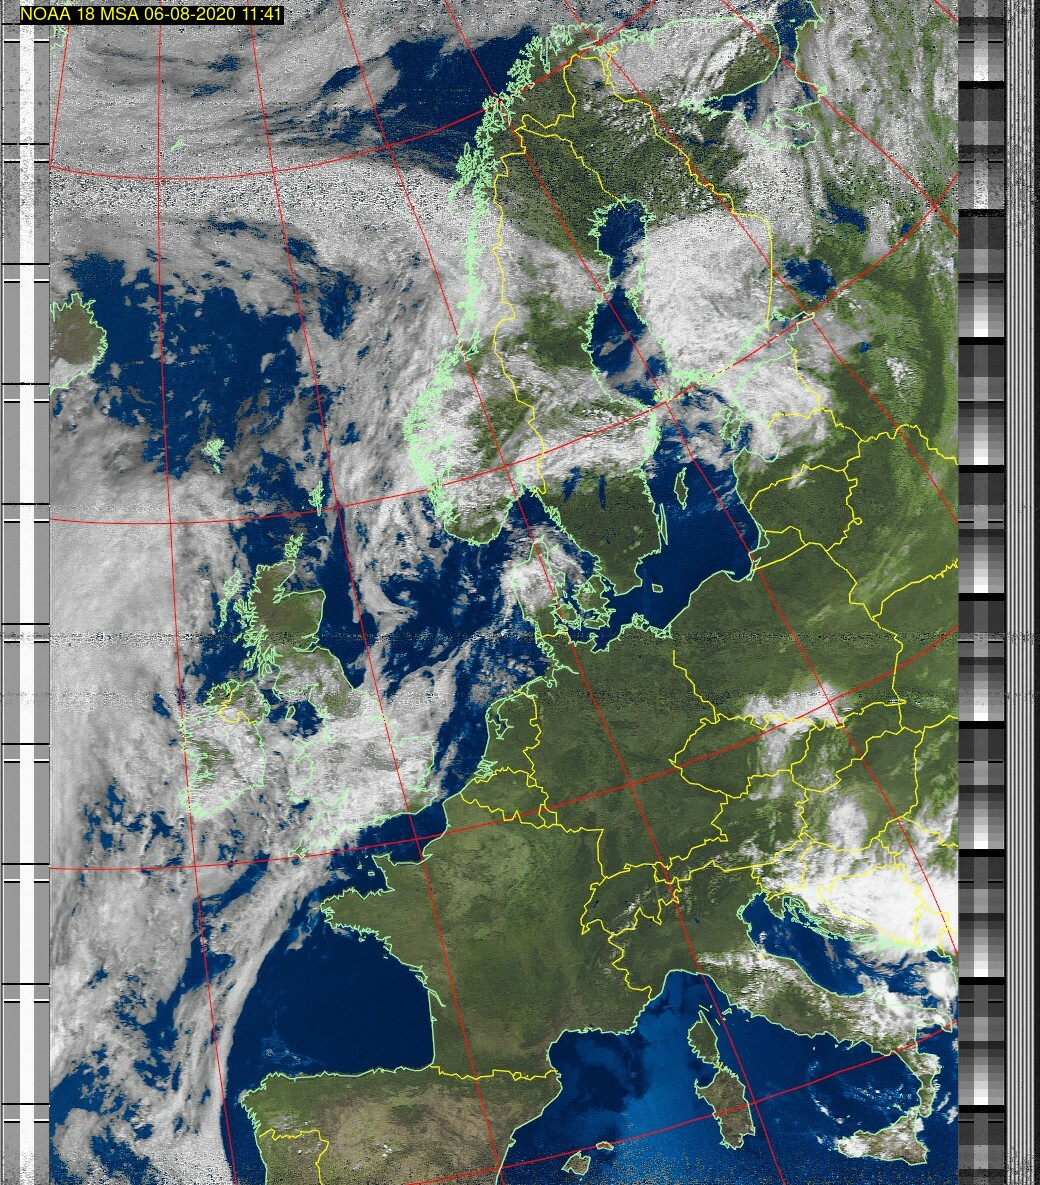 Wetter Satellit: NOAA 18 06-08-2020 11:41. Elevation maximal: 76 Grad. #NOAA #weather #noaasatellite #clima #wxtoimg #rtlsdr #raspberrypi #germany #wetterpic.twitter.com/iQgK74cf7z